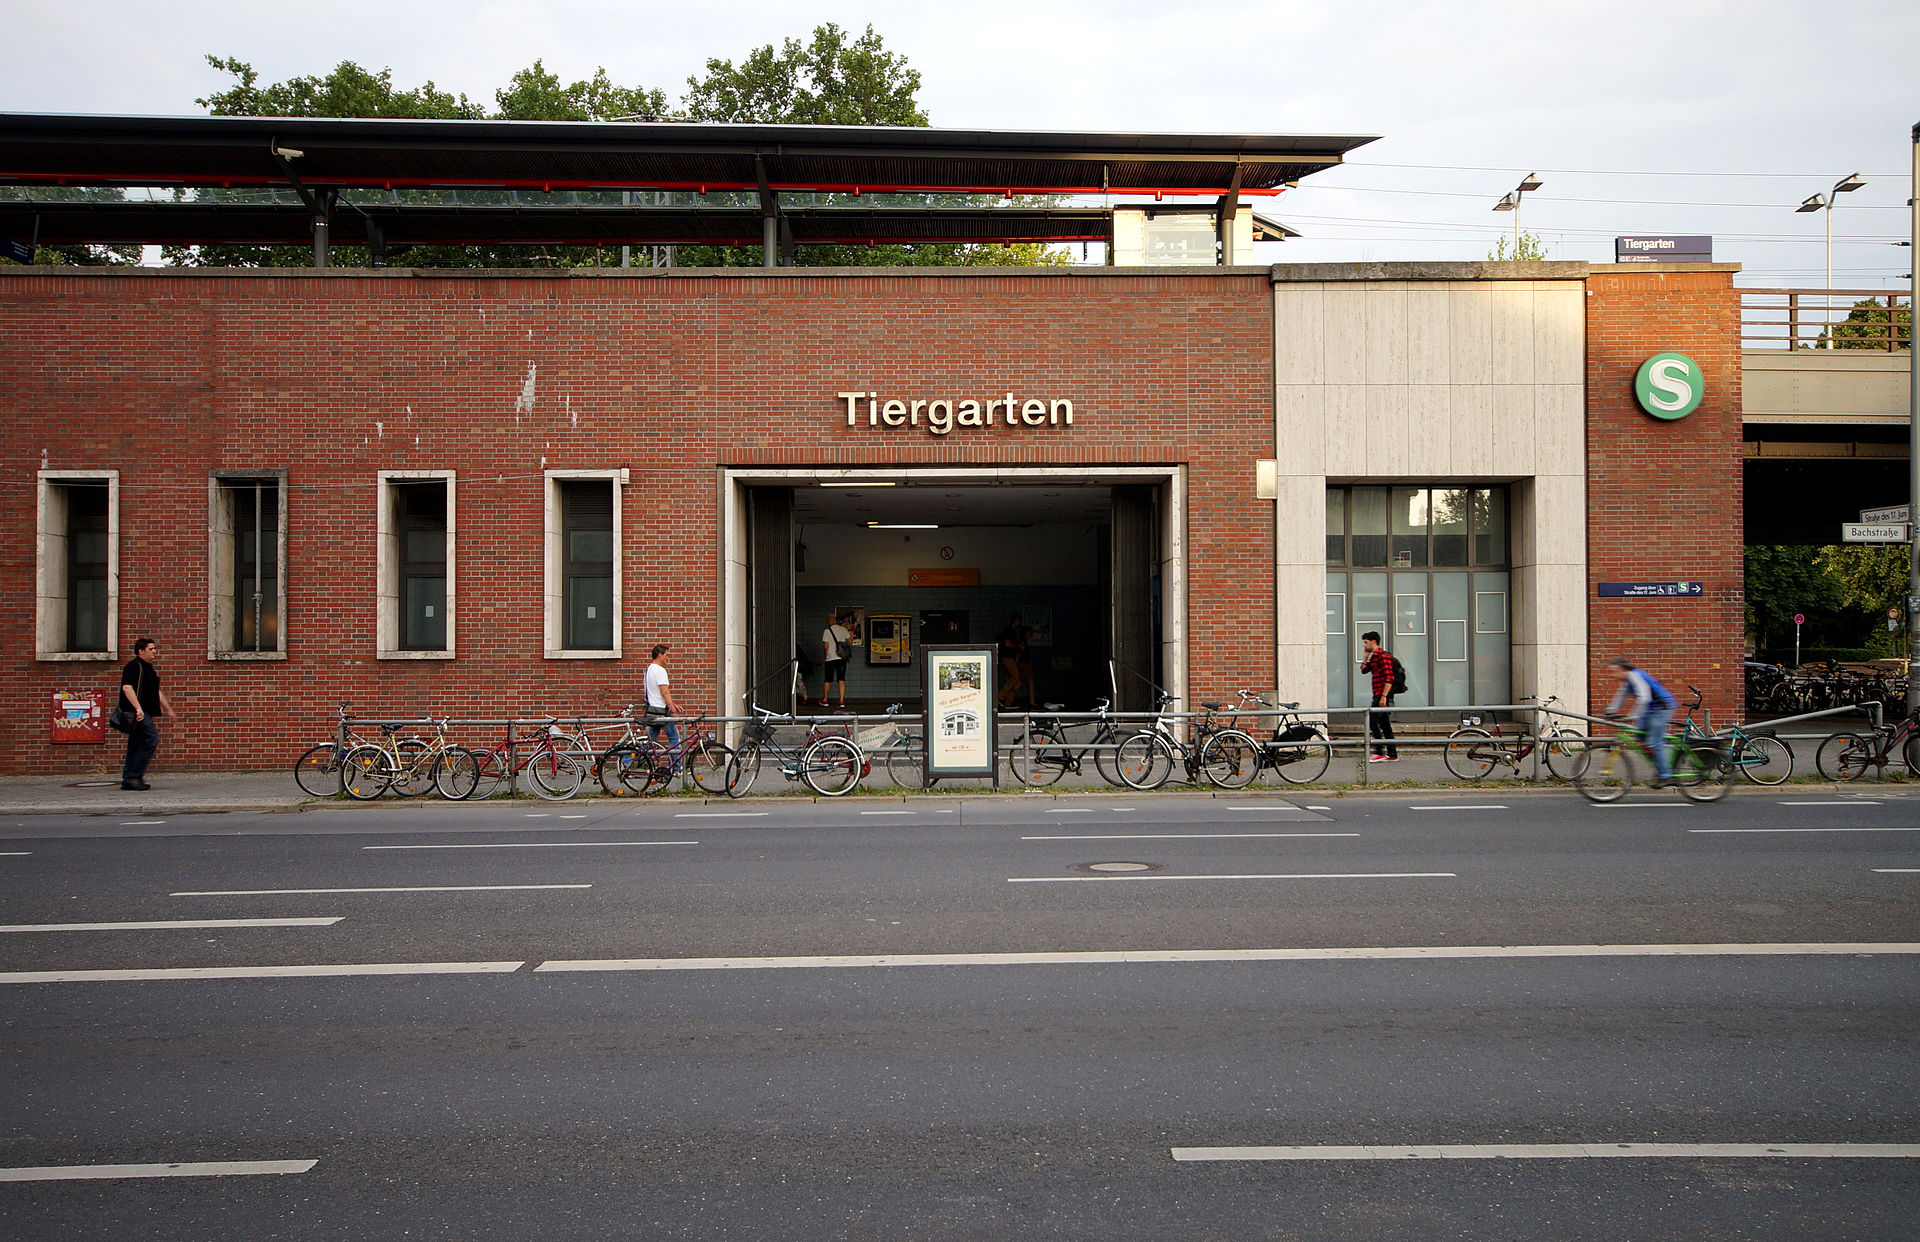 bahnhof berlin tiergarten wikipedia. Black Bedroom Furniture Sets. Home Design Ideas